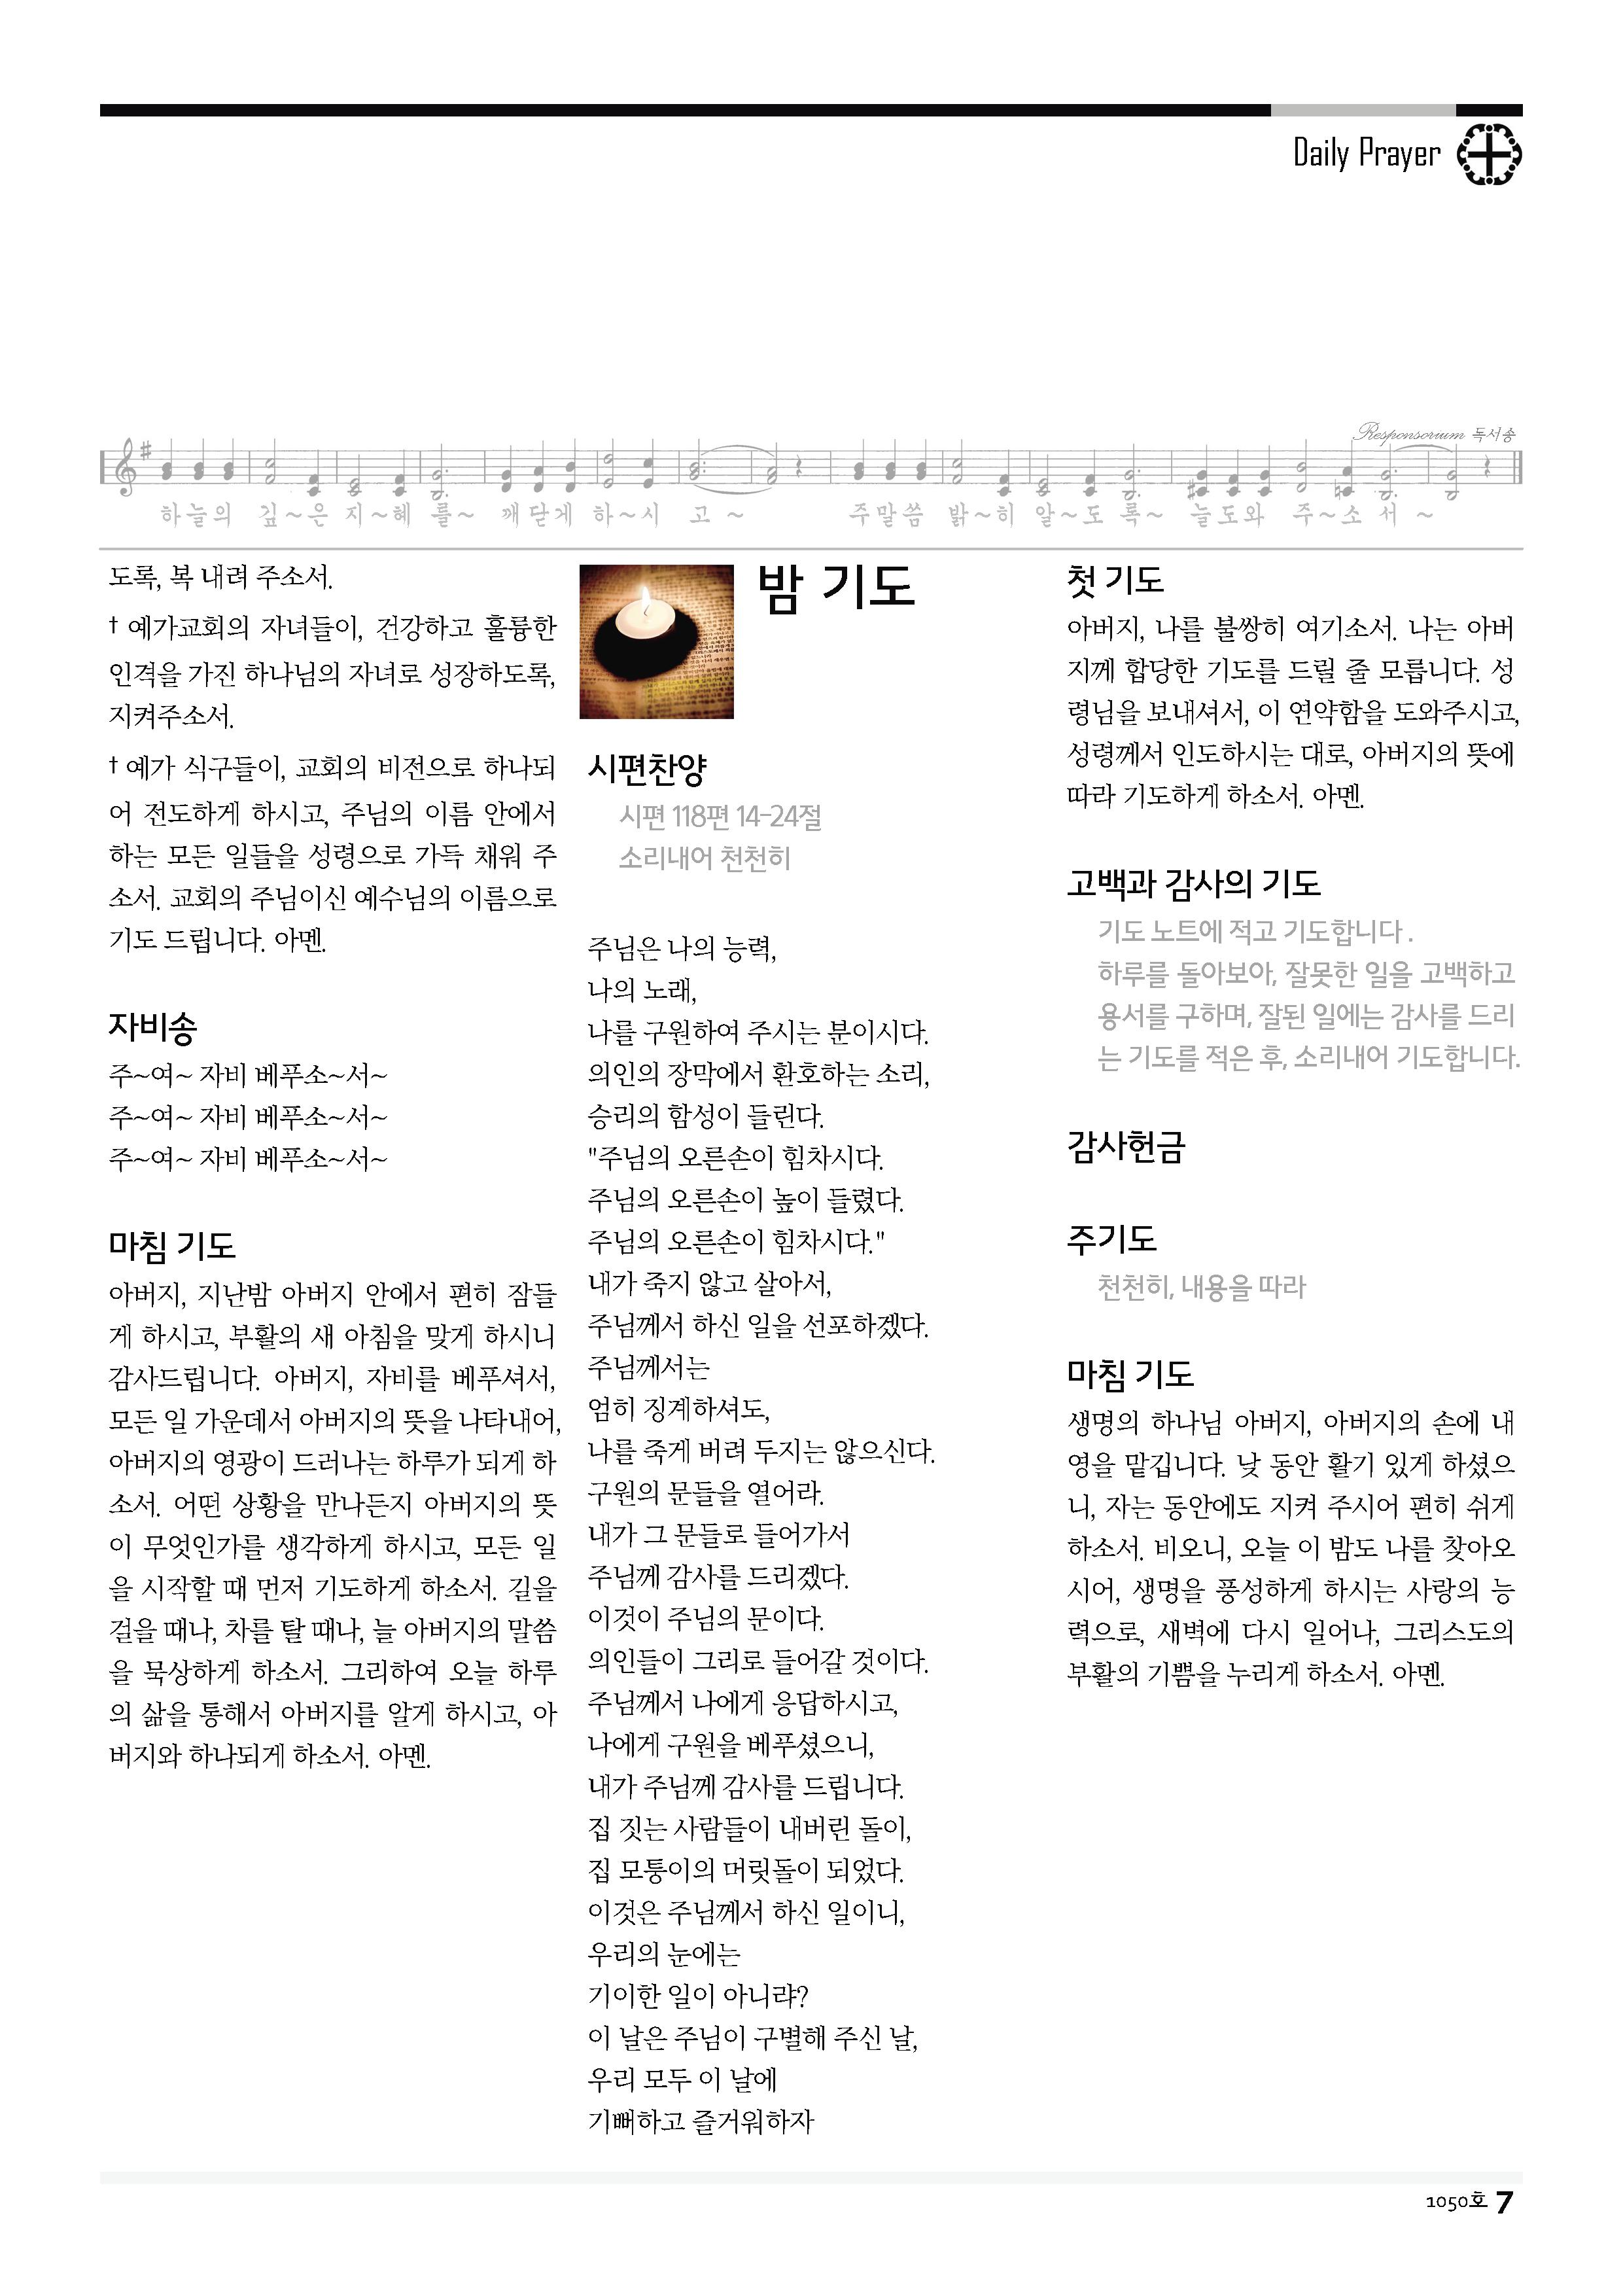 18sdjb0401_페이지_07.png